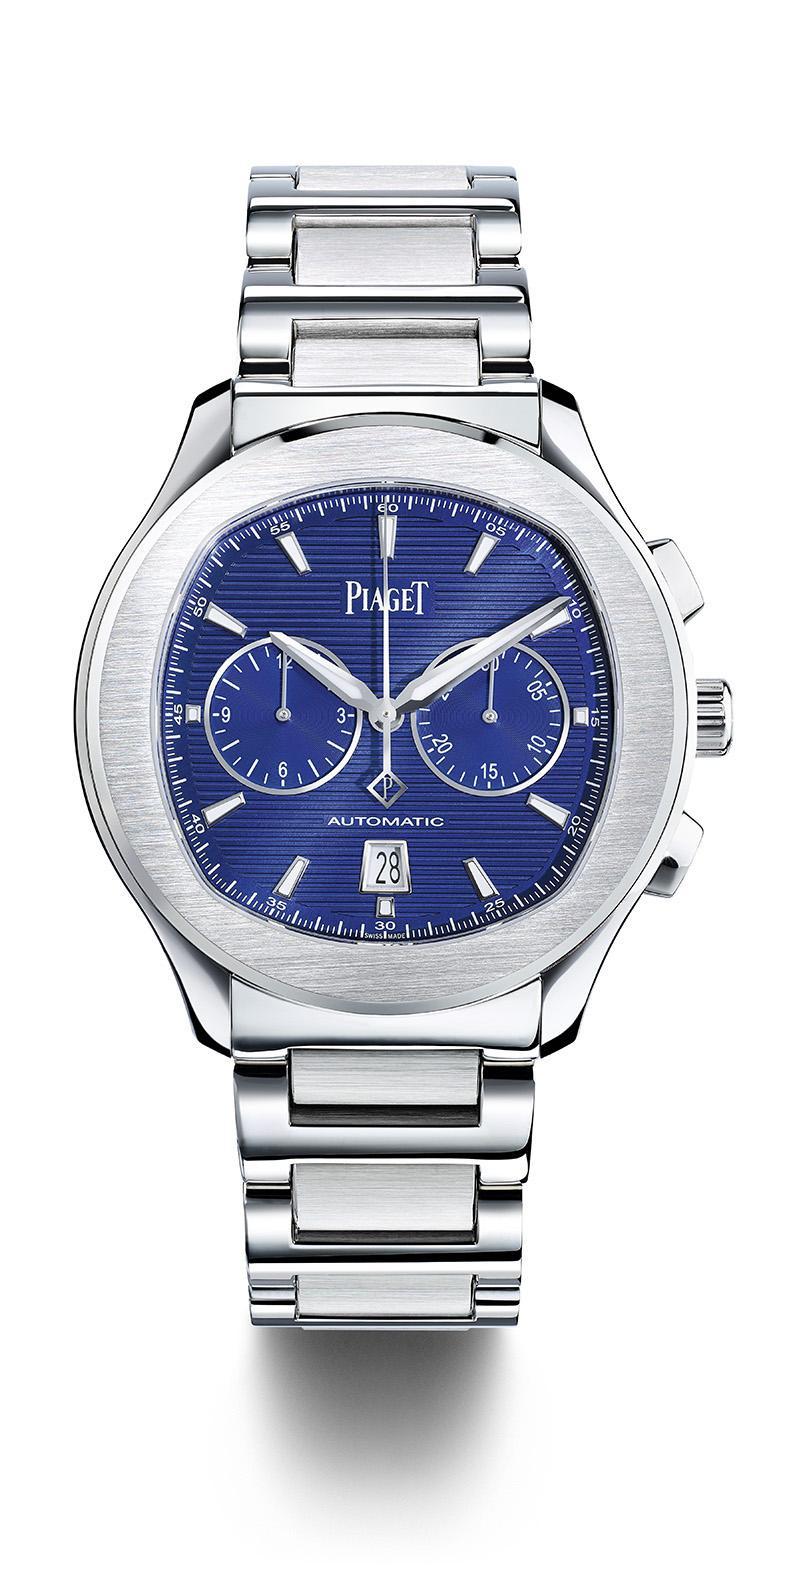 PIAGET Polo S Chronograph 1160P自動上鍊機芯/不鏽鋼陶瓷材質/錶徑42mm/時間、日期顯示/計時碼錶功能/藍寶石水晶錶鏡、底蓋/防水100米/建議售價:NT$ 467,000